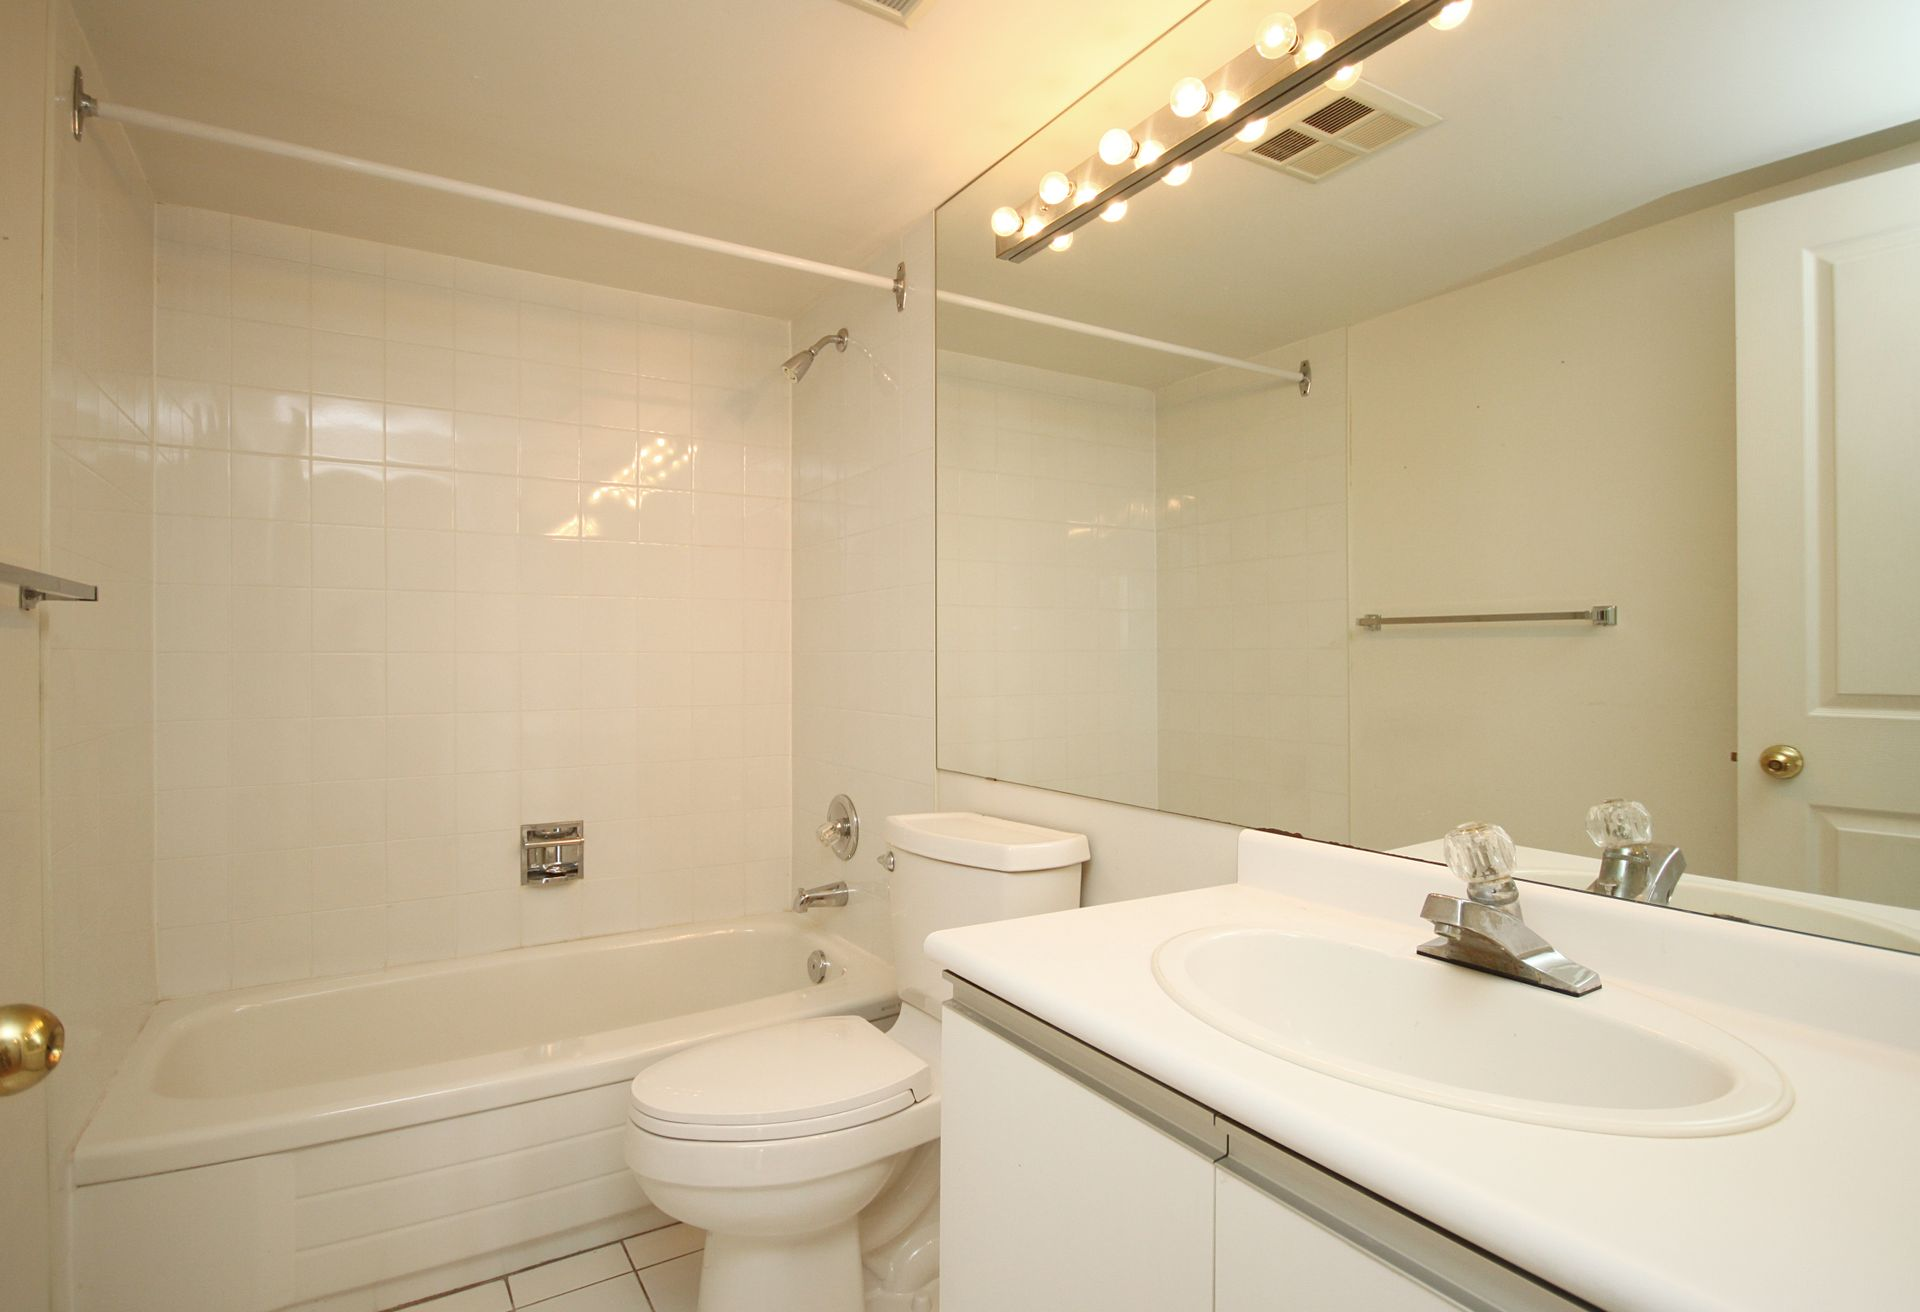 4 Piece Bathroom at PH211 - 1121 Steeles Avenue W, Westminster-Branson, Toronto